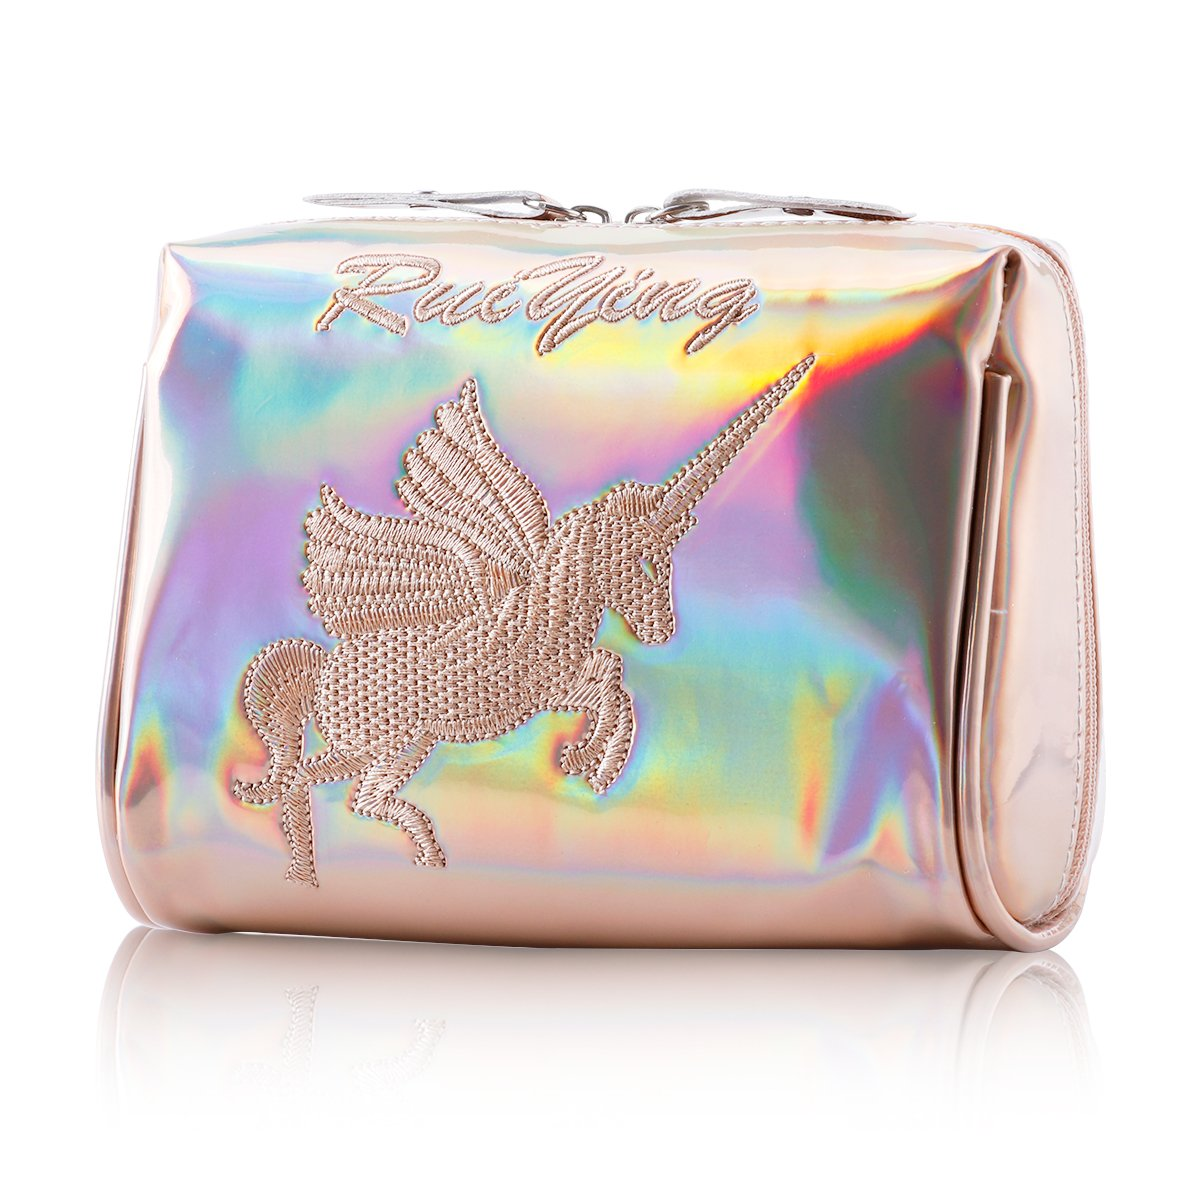 Makeup Bag Portable Zipper Handbag Embroidered Unicorn Travel Cosmetic Bag Wallet Cellphone Bag (Champagne)